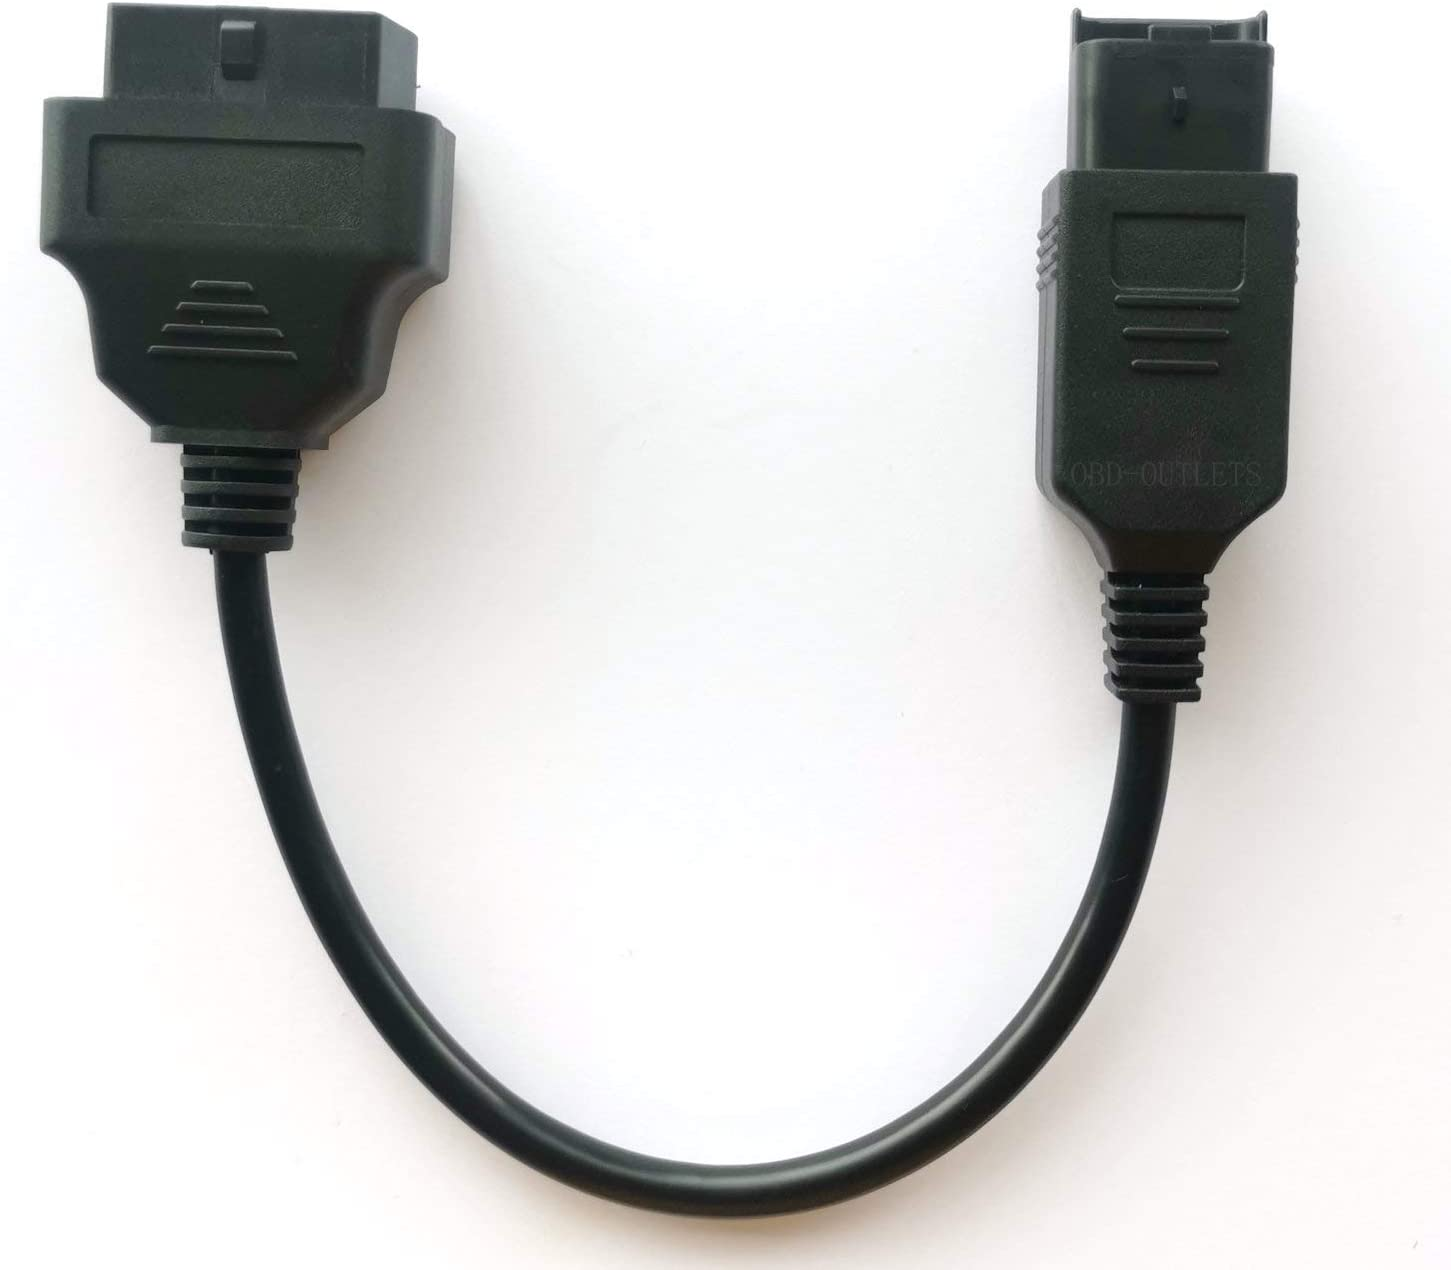 Motorbike OBD 4 Pin Diagnostic Adapter for Du-Cati, Multistrada Motorcycle OBDII DDA Can-Bus Connector